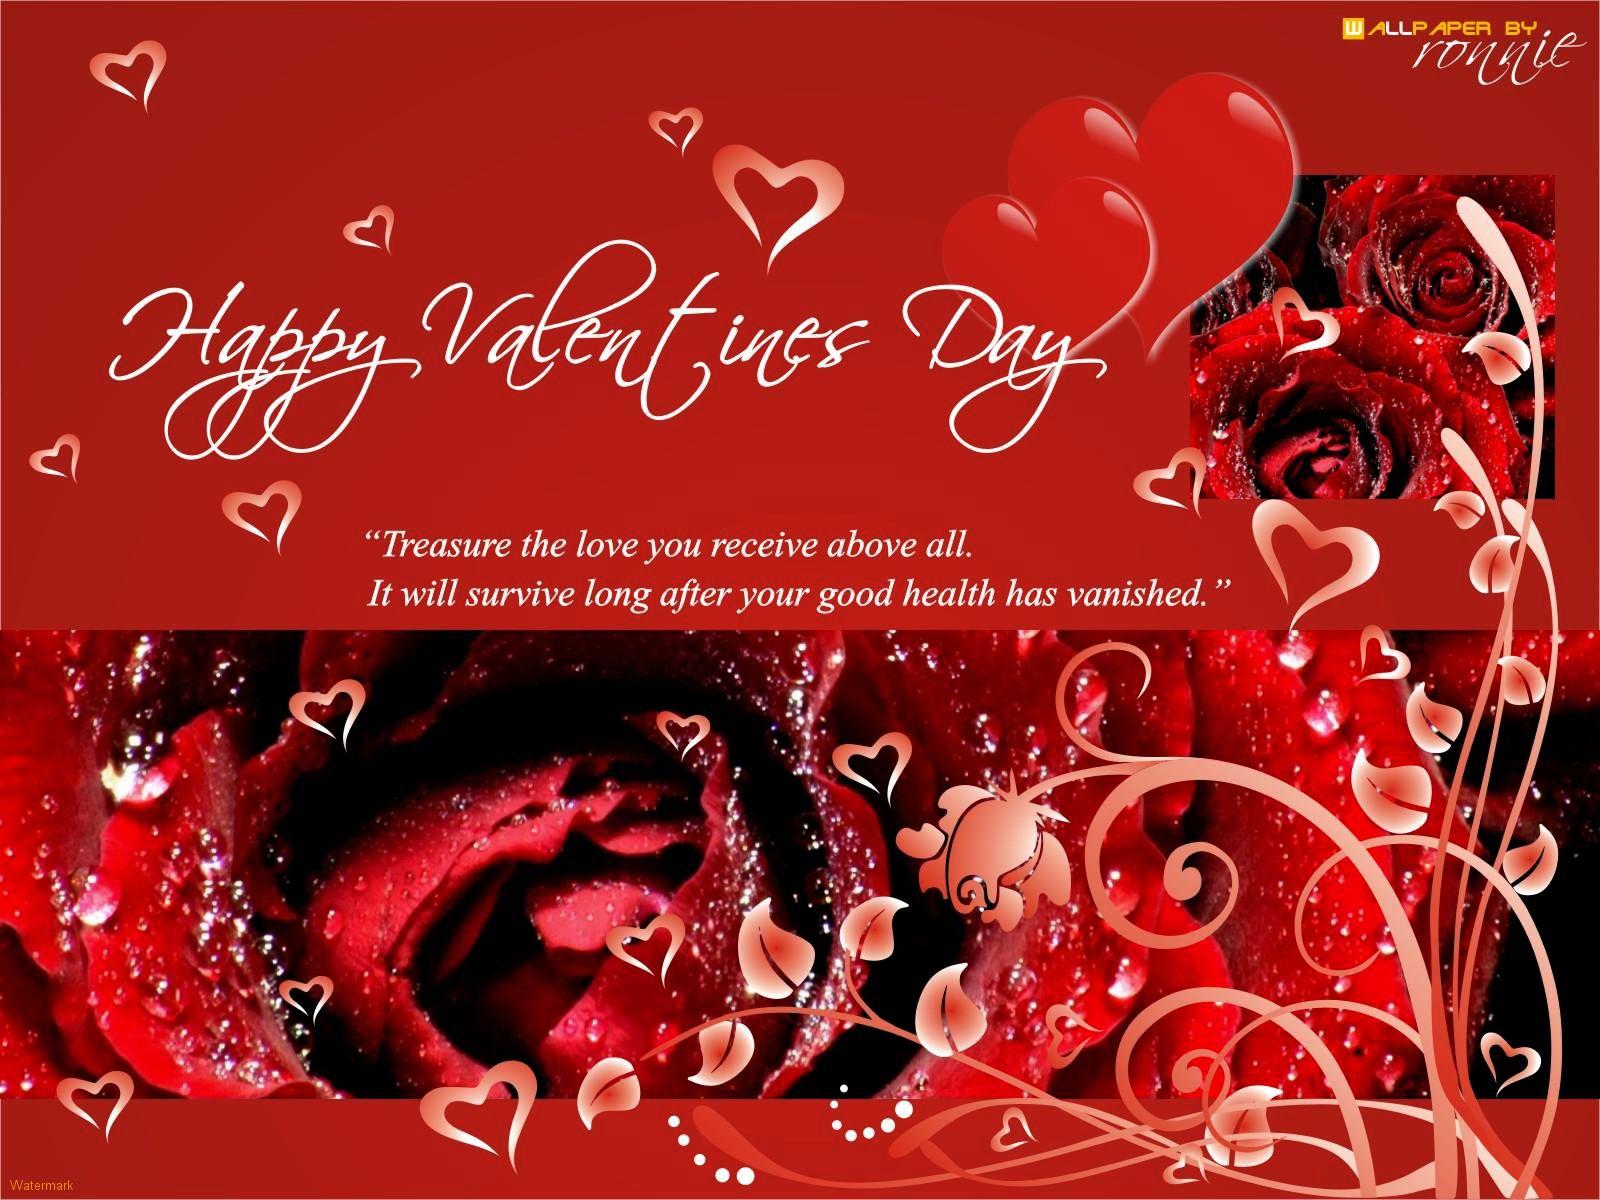 Happy valentines day my valentine pinterest explore happy valentines day cards and more kristyandbryce Gallery